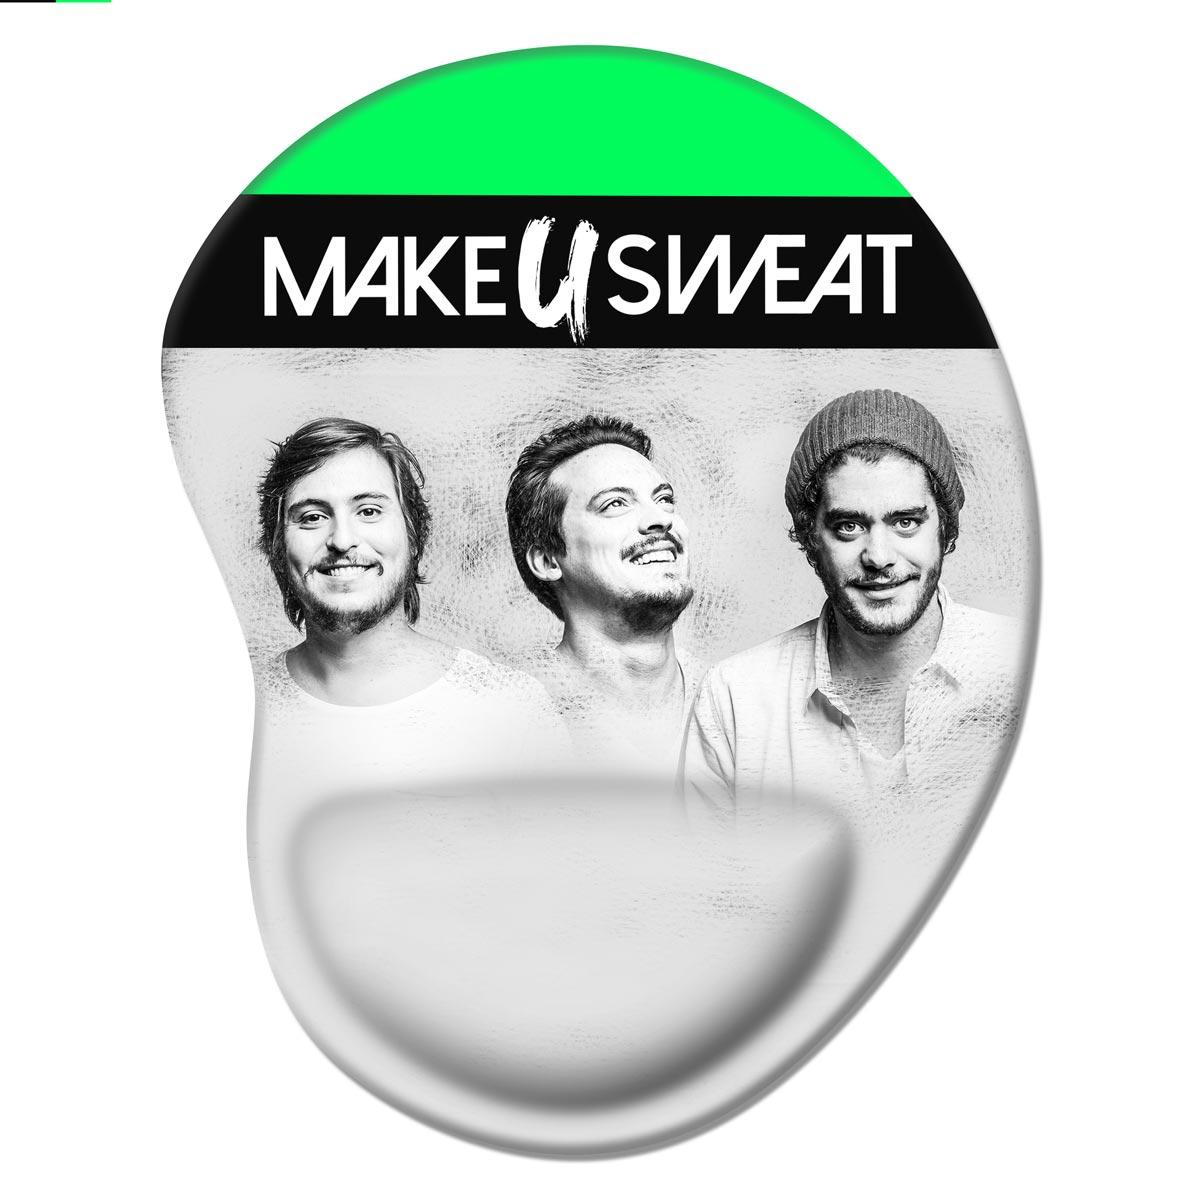 Mousepad Make U Sweat Trio